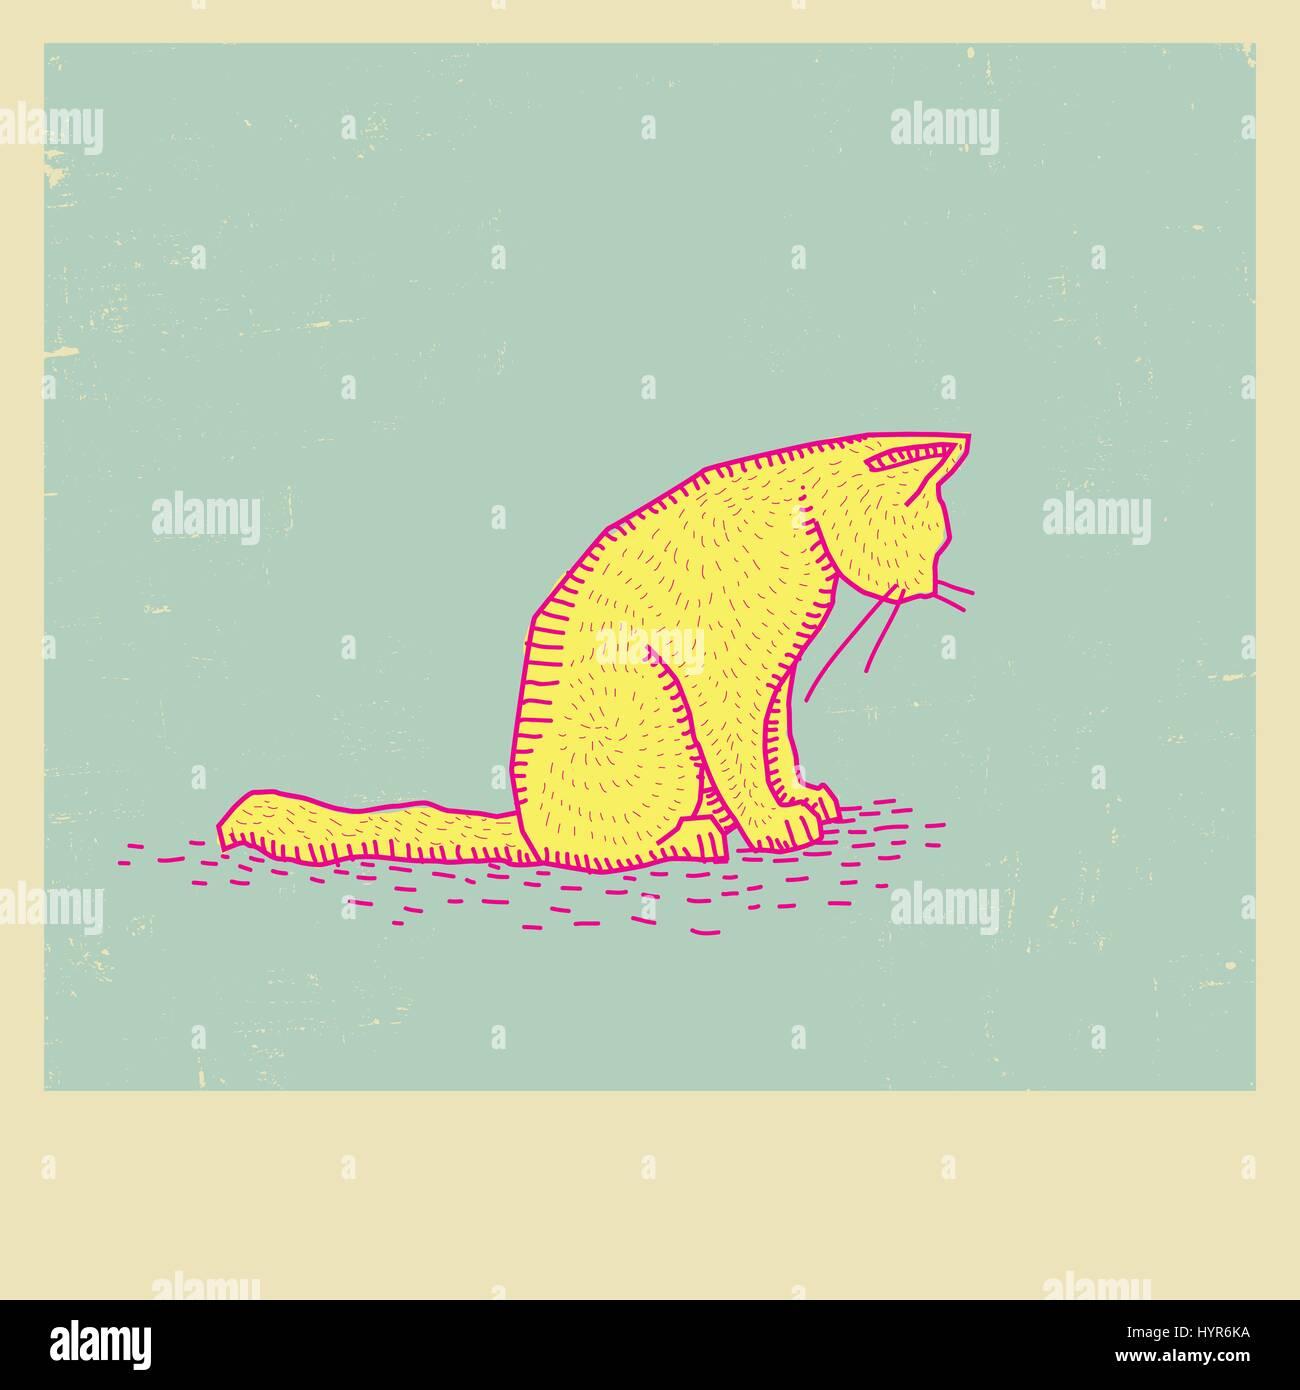 Vektor-Skizze, Zeichnung Katze auf Bilderrahmen Vektor Abbildung ...